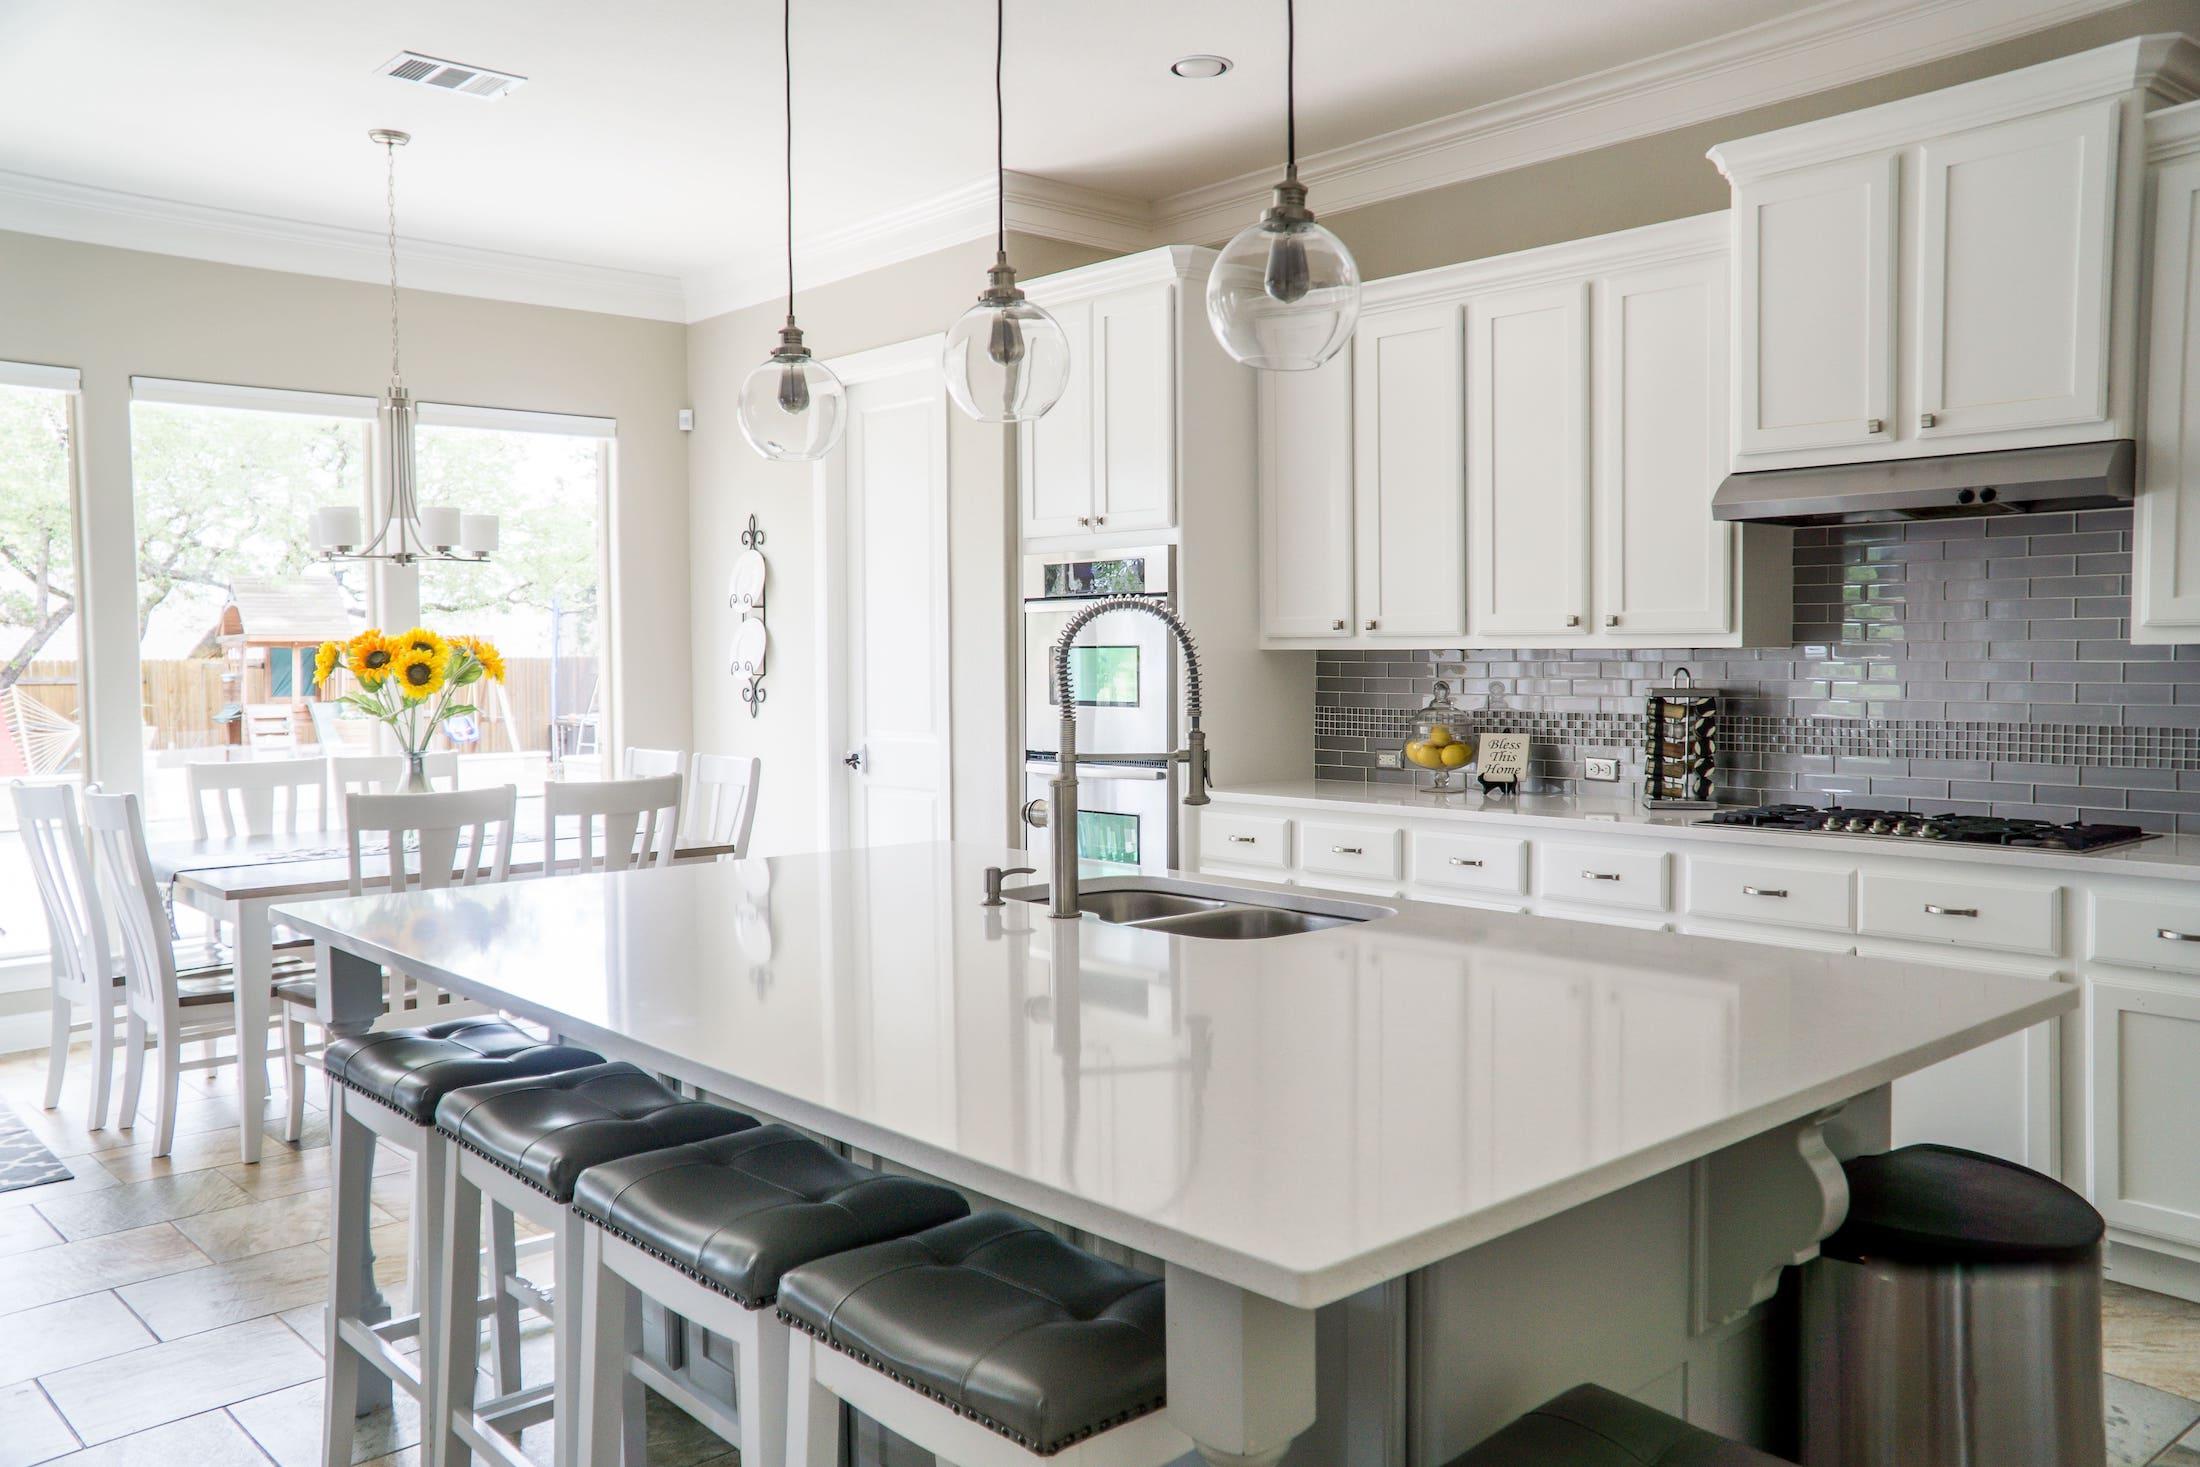 Kitchen Cabinets in New Jersey by InFocus Kitchen & Bath